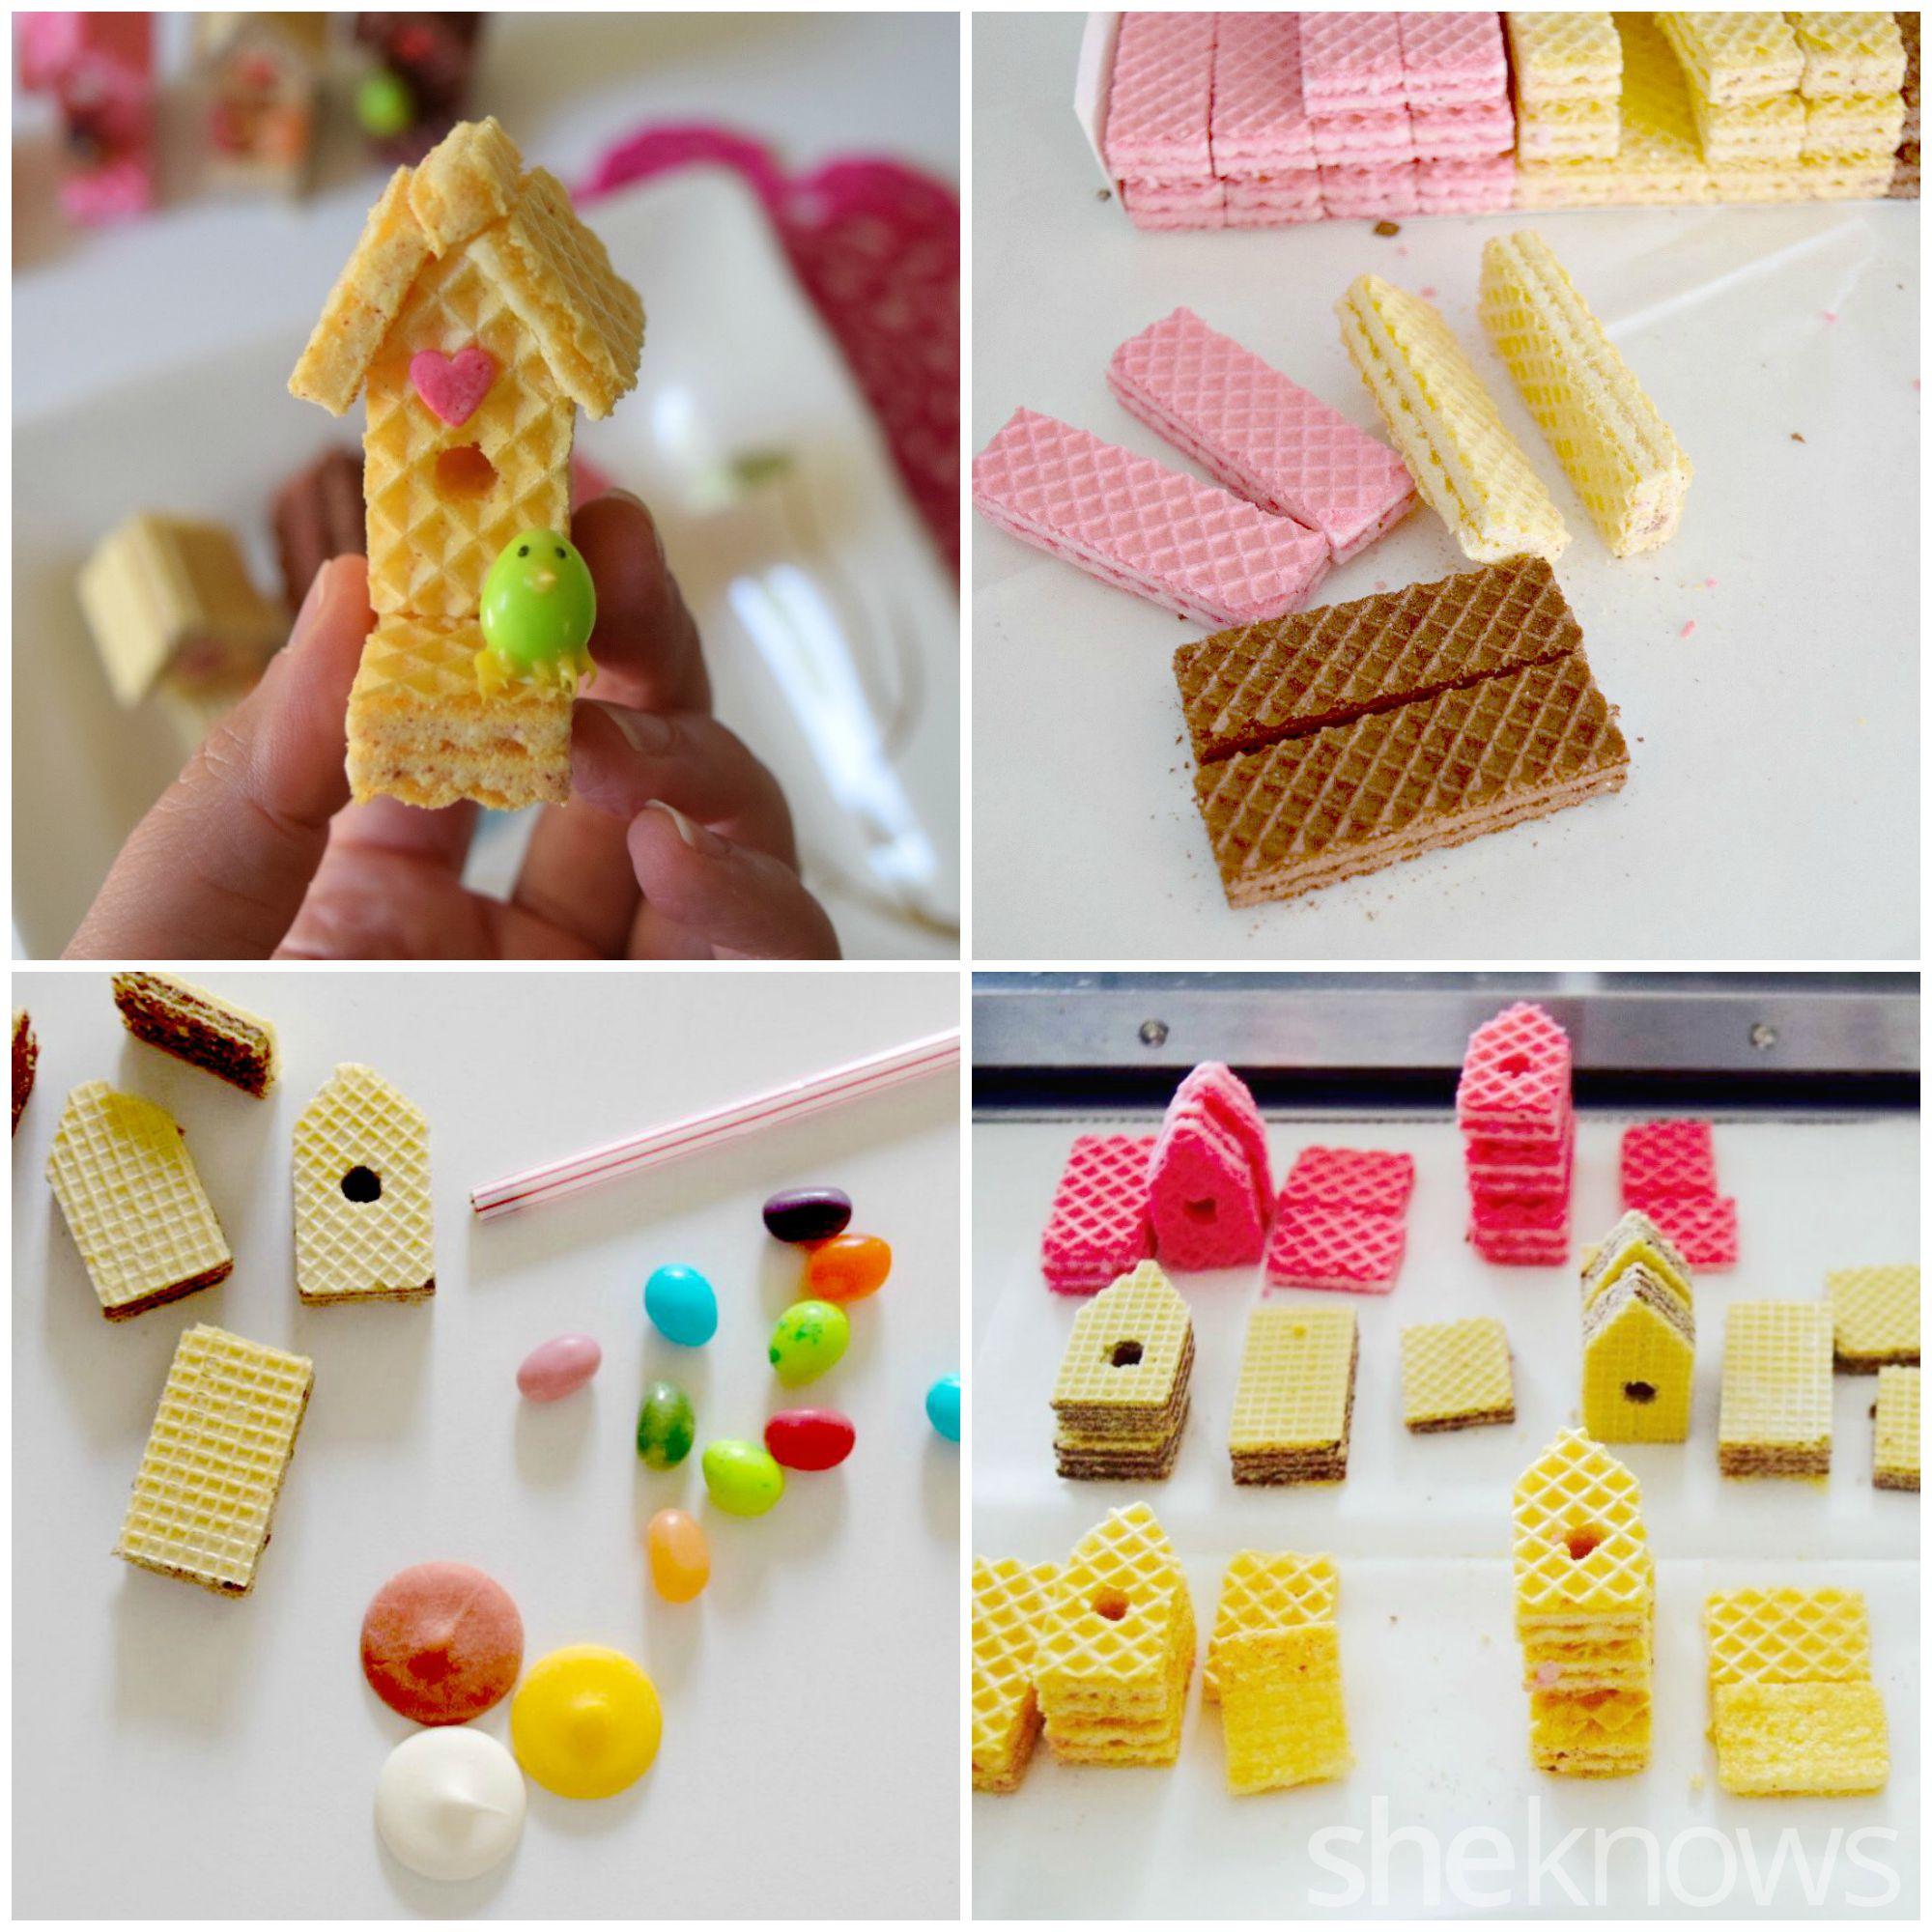 How to Make Sugar Wafer Bird House